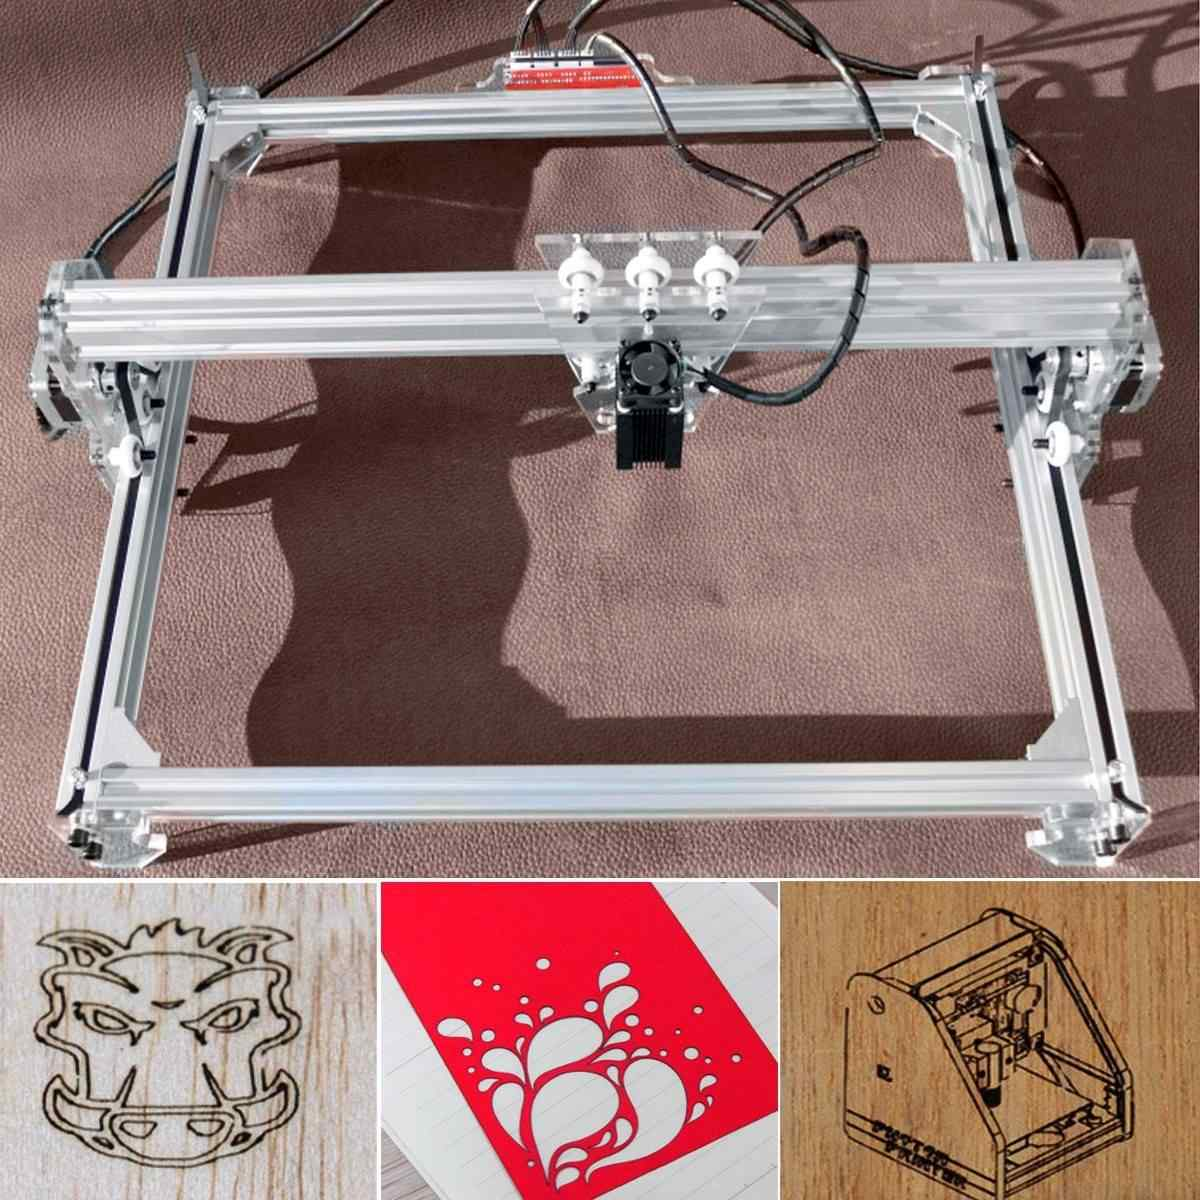 15 W/3000 mw 50*65cm CNC grabador láser máquina de grabado para Metal/ENRUTADOR de madera/cortador DIY 2 ejes grabador cortadora de escritorio + láser